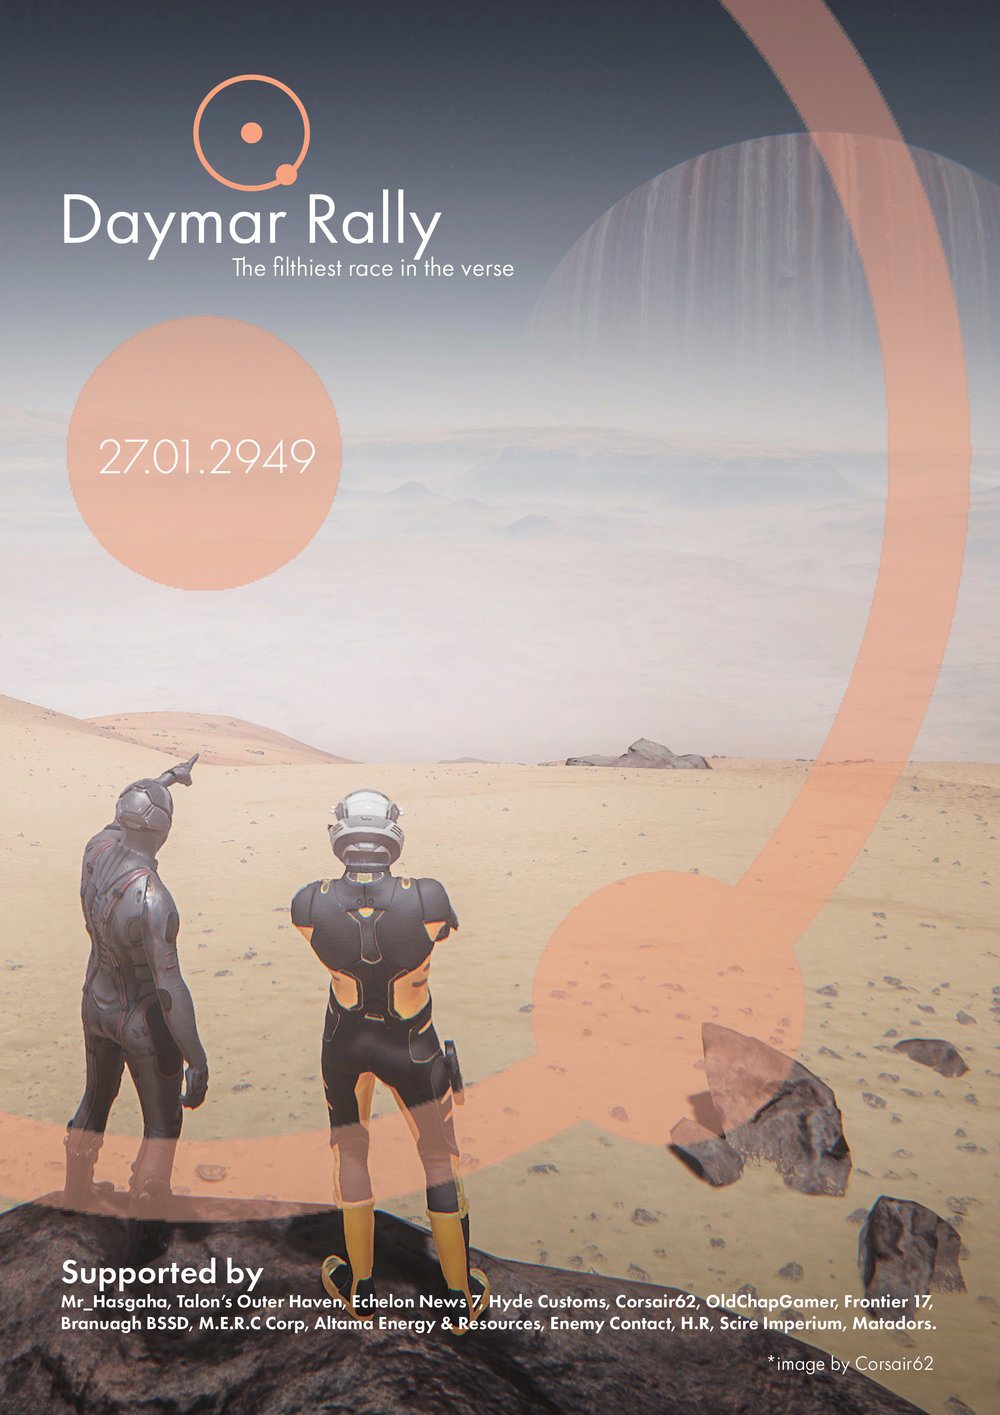 DaymarRally_Poster4.jpg